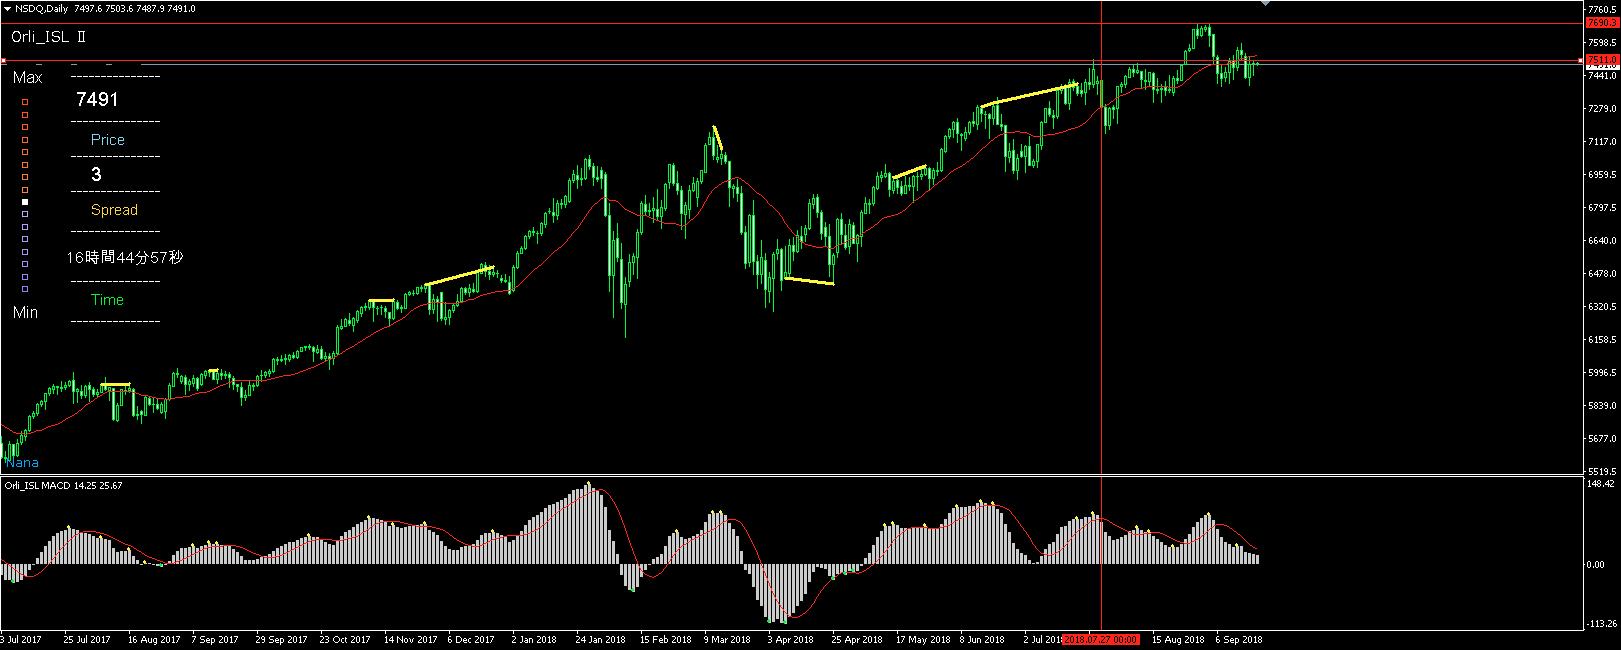 nsdq_chart_18_09_20.png